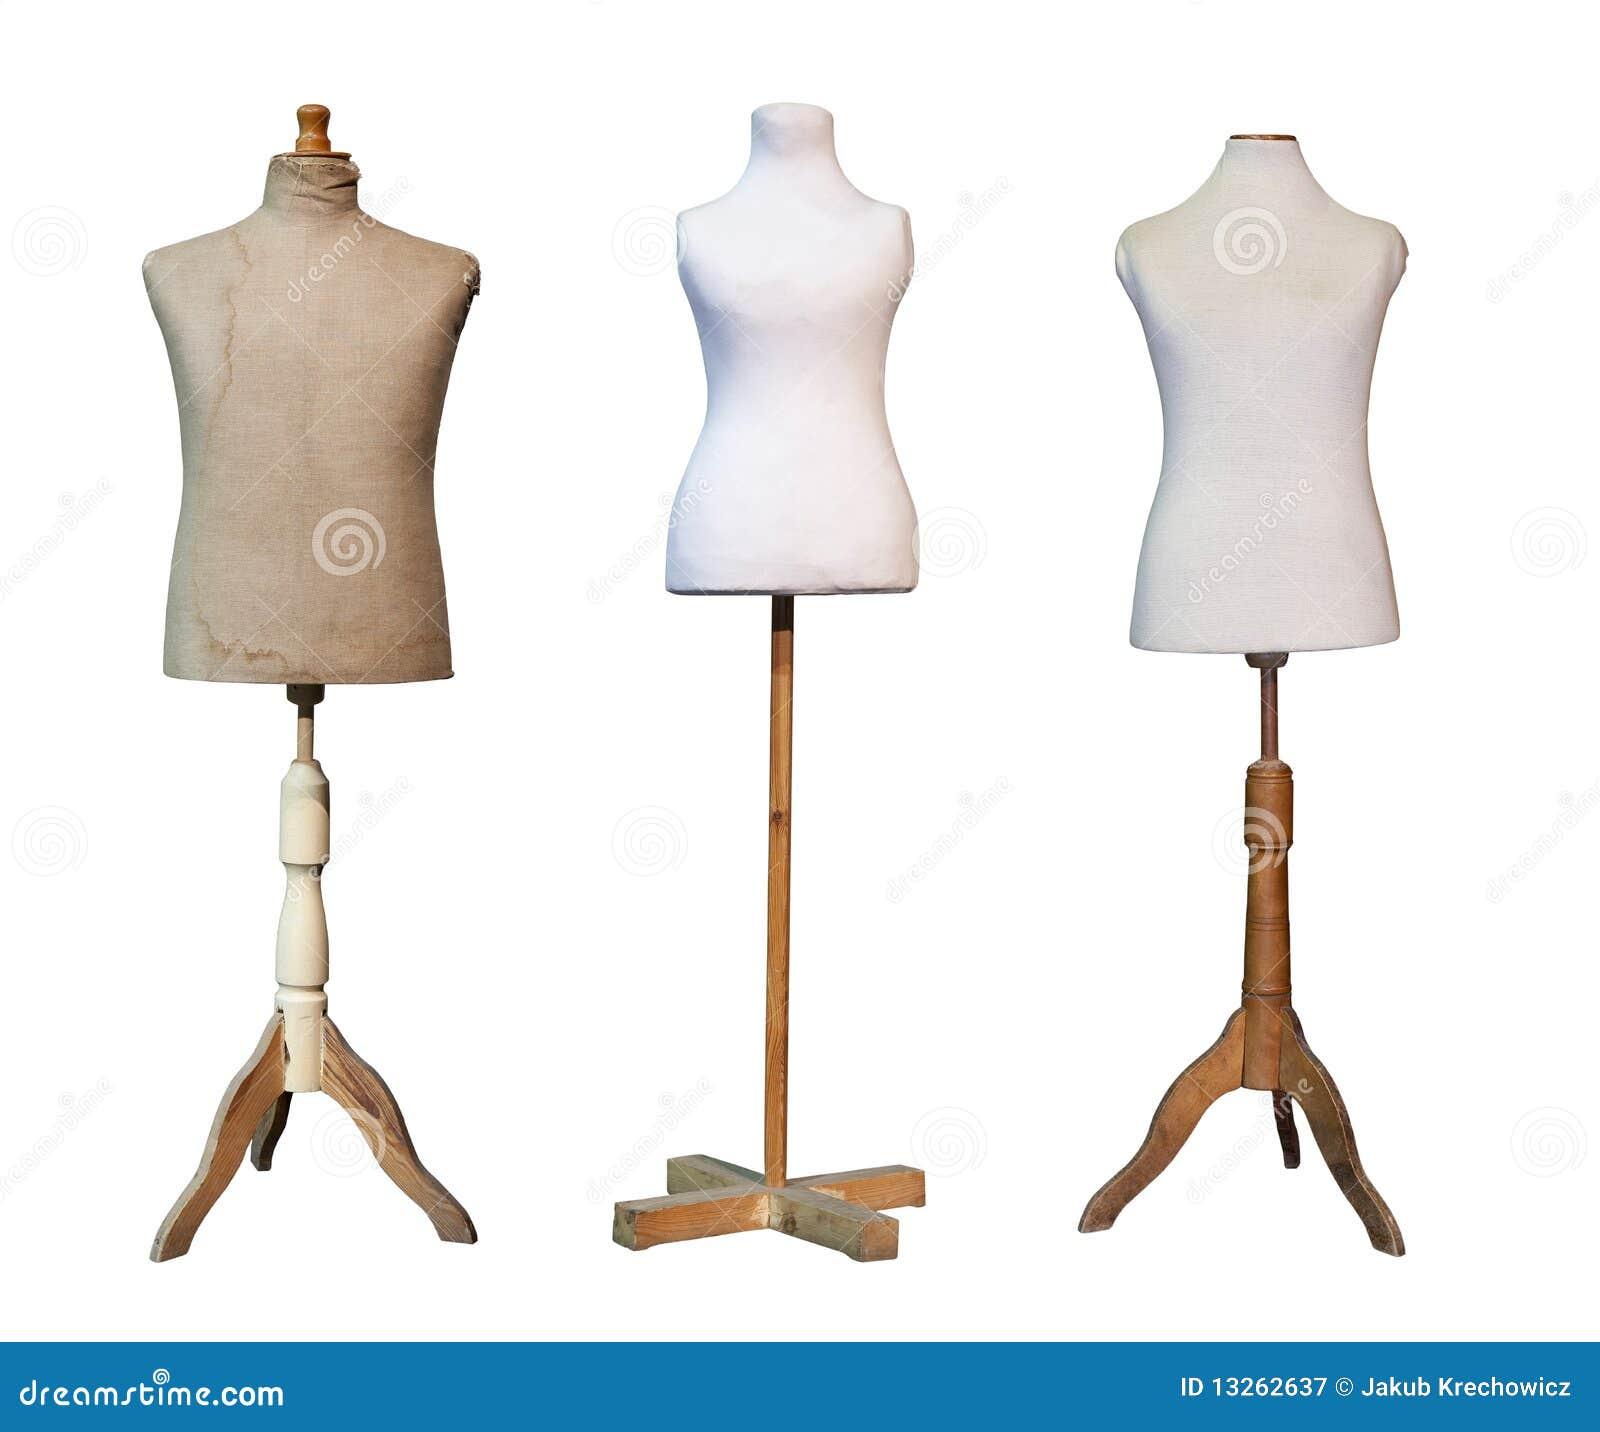 Fashion Design For Dummies